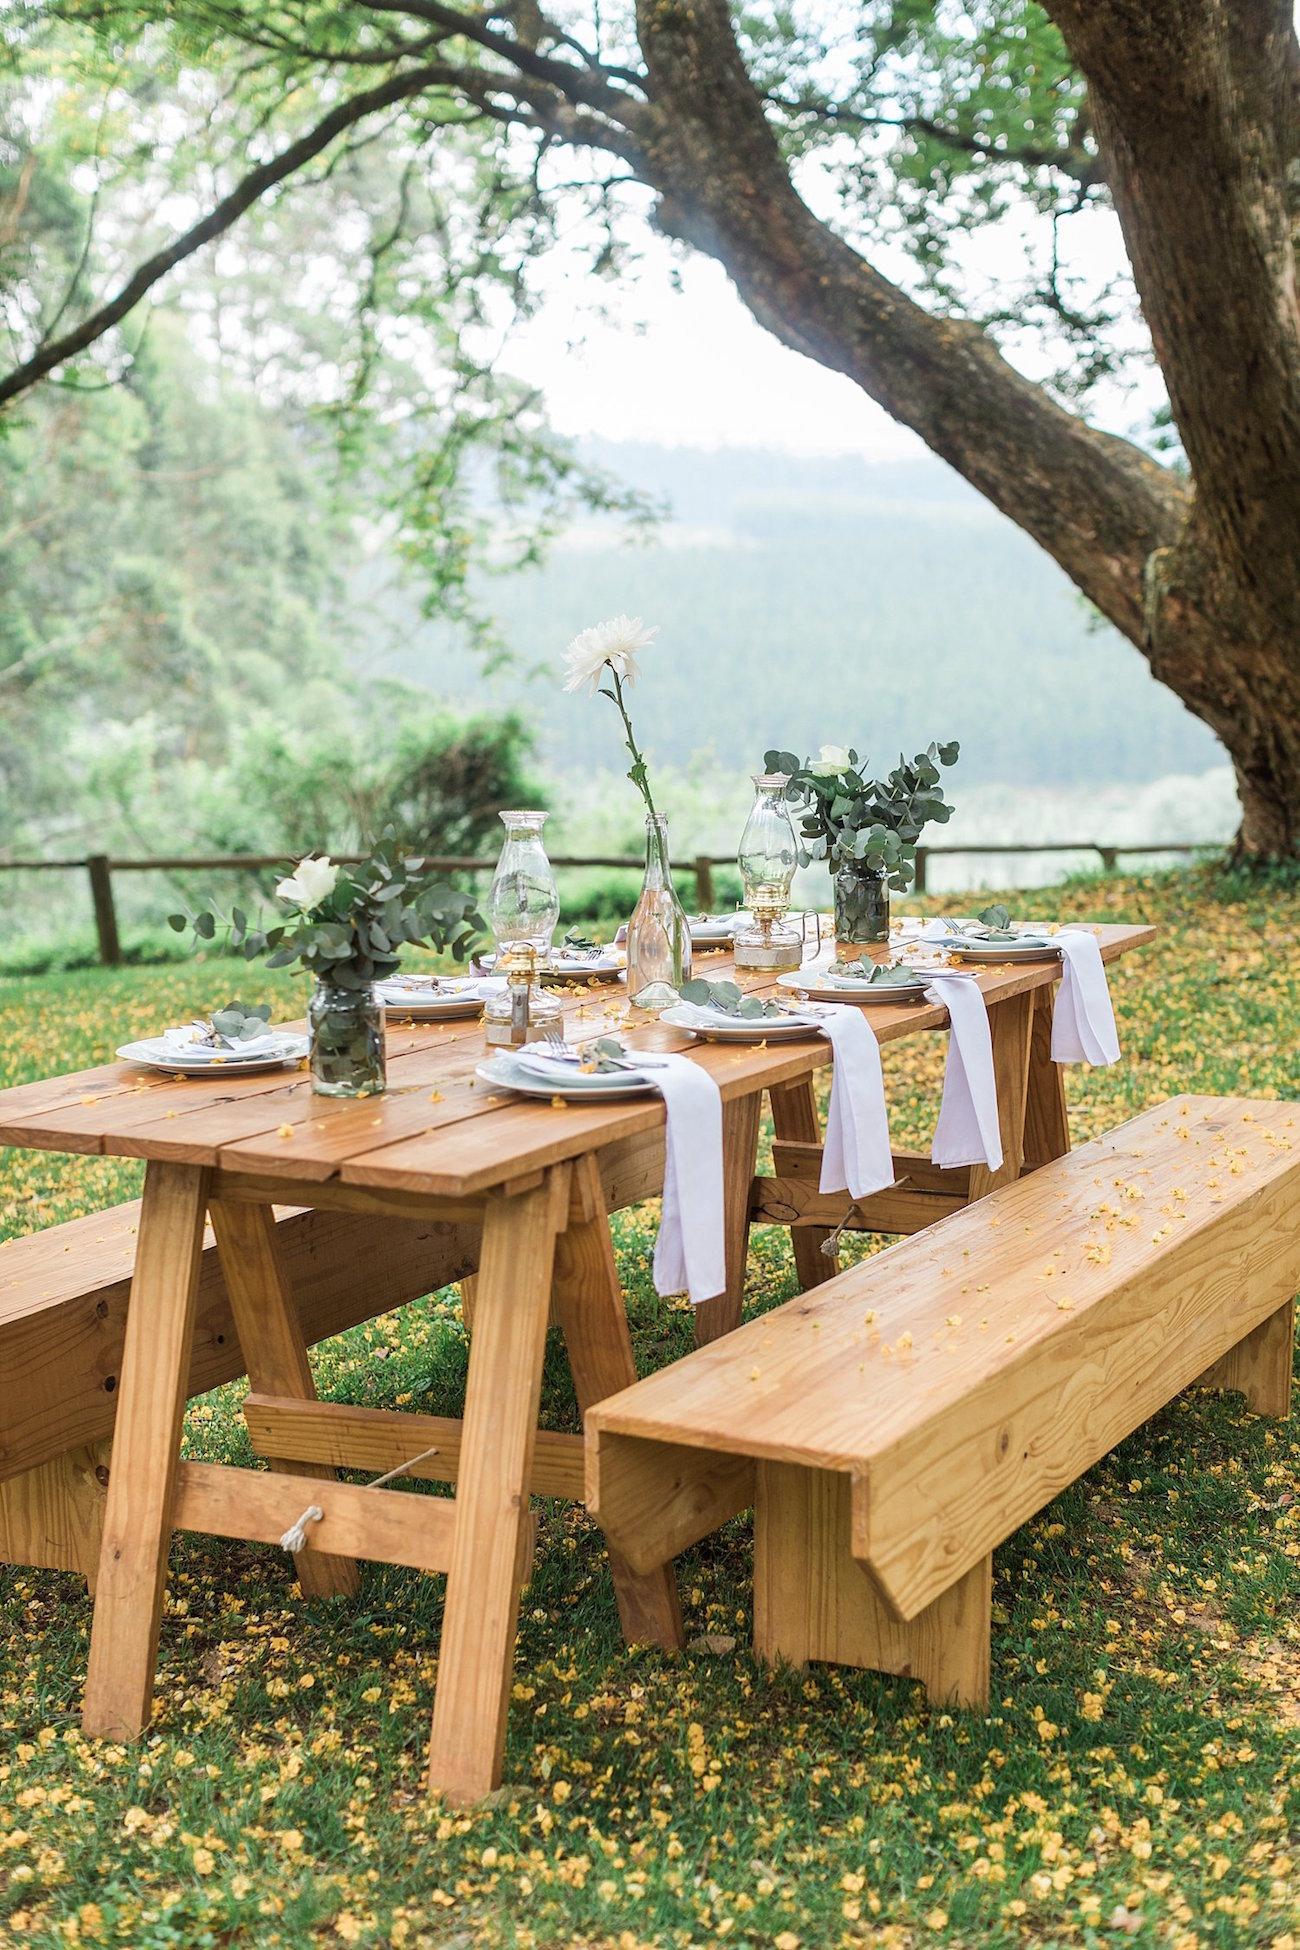 Wooden Picnic Tables Wedding | Image: Alicia Landman